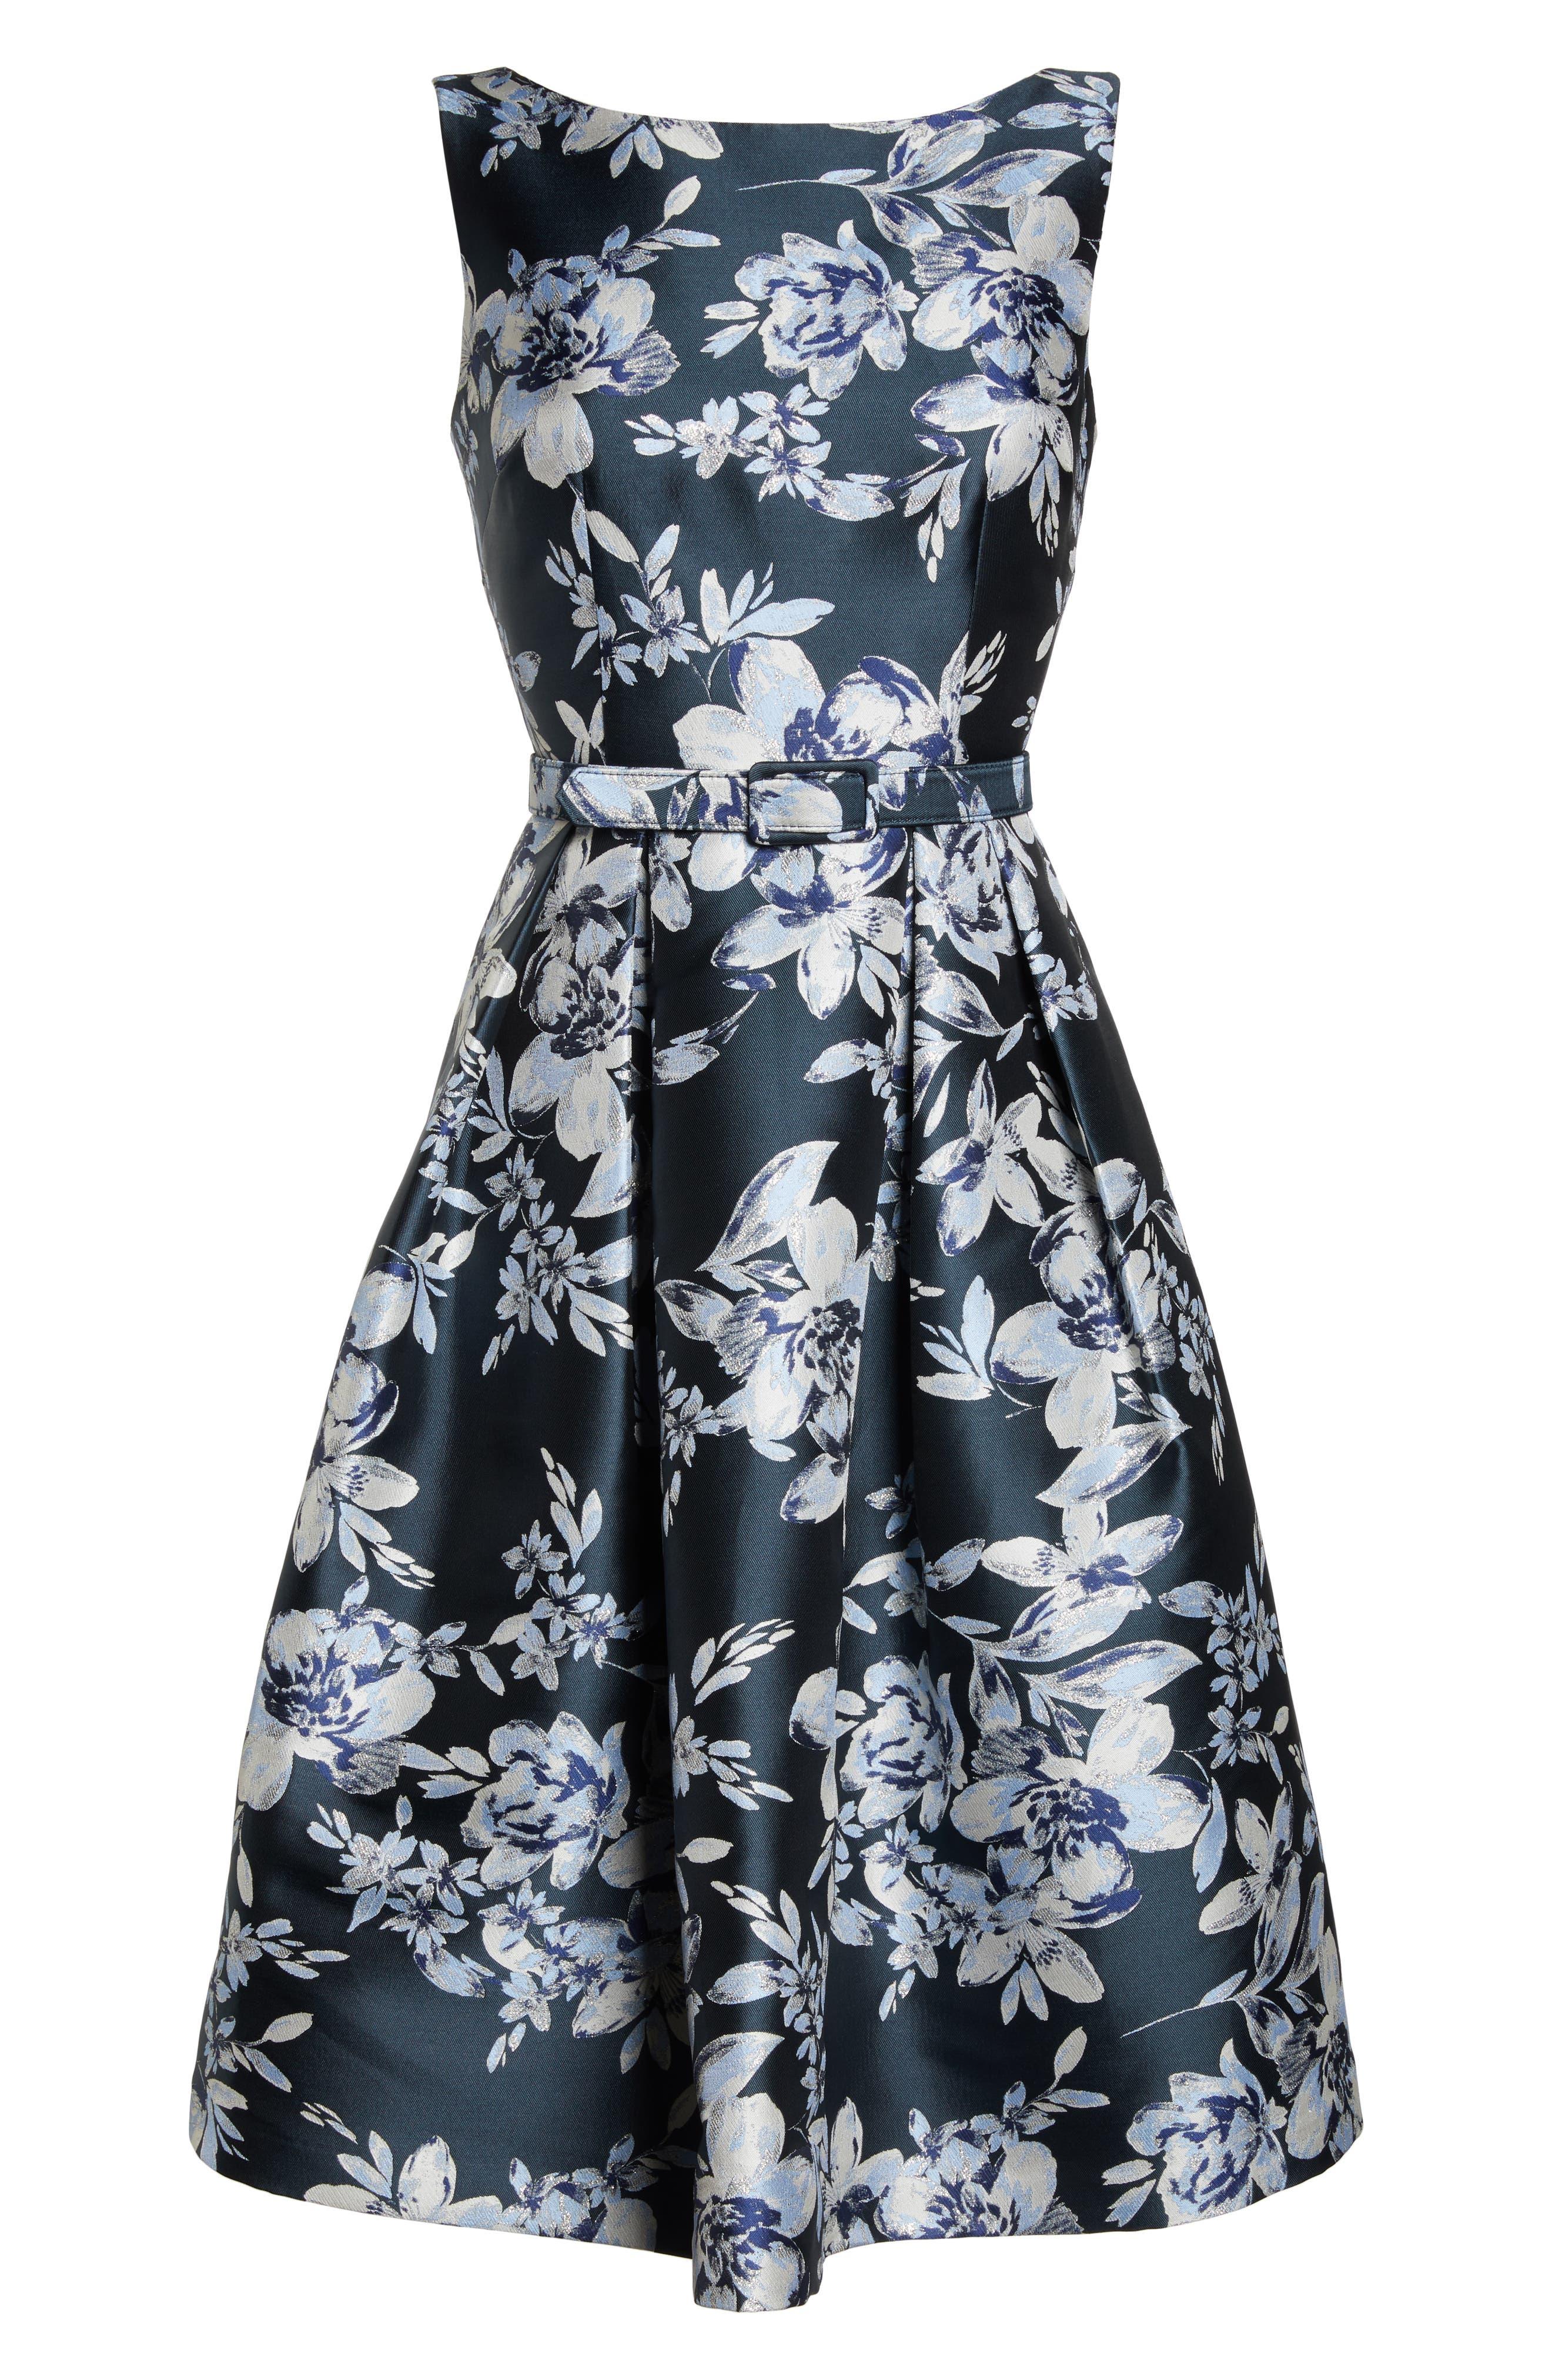 ELIZA J, Metallic Floral Belted Fit & Flare Dress, Alternate thumbnail 7, color, NAVY